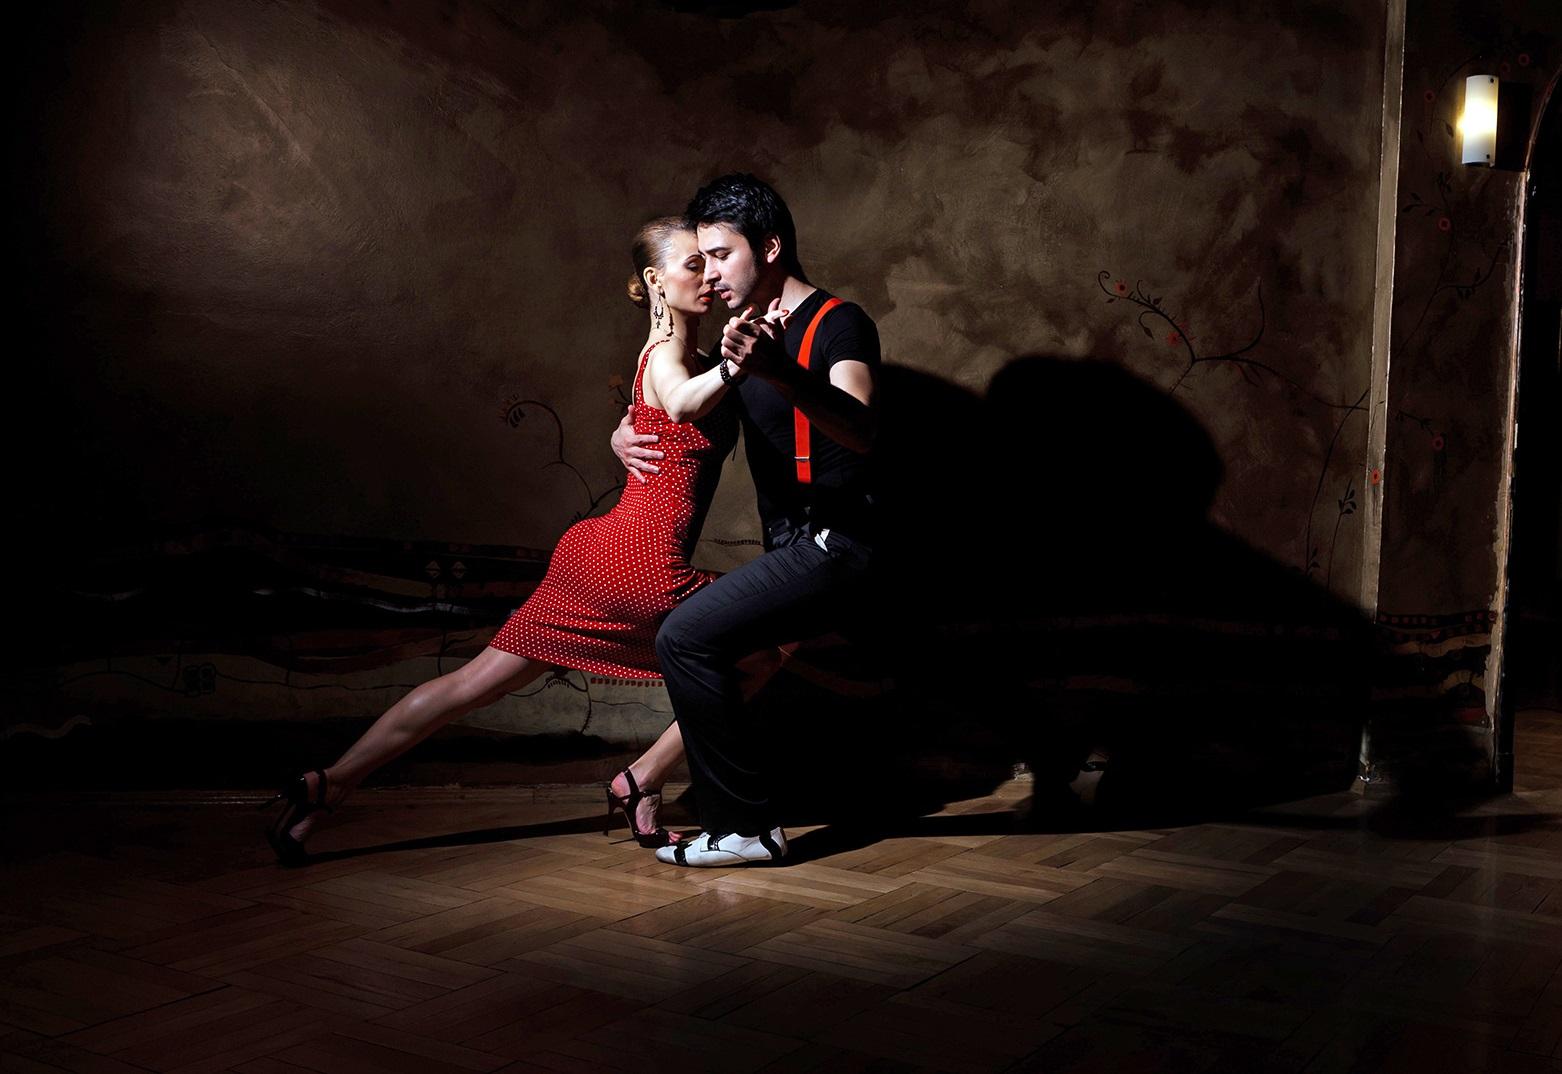 Dating χορεύτρια σάλσατελευταία από εμάς προξενιό